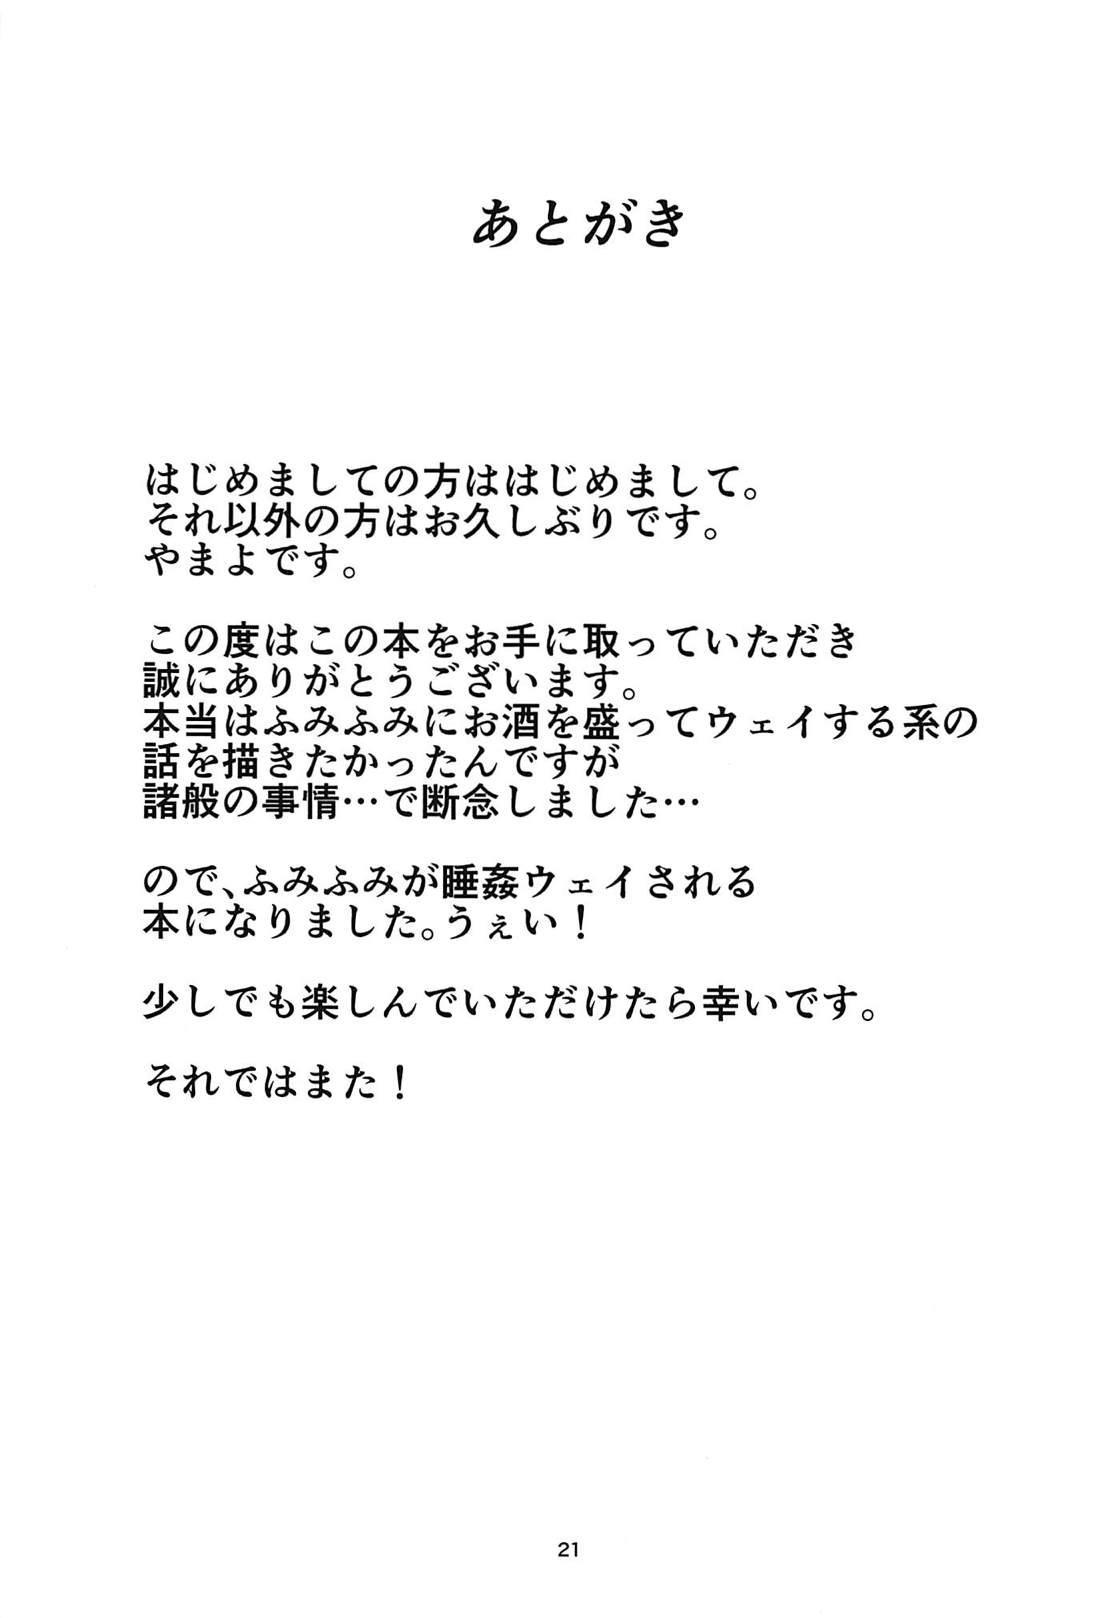 Fumika x Suikan 18